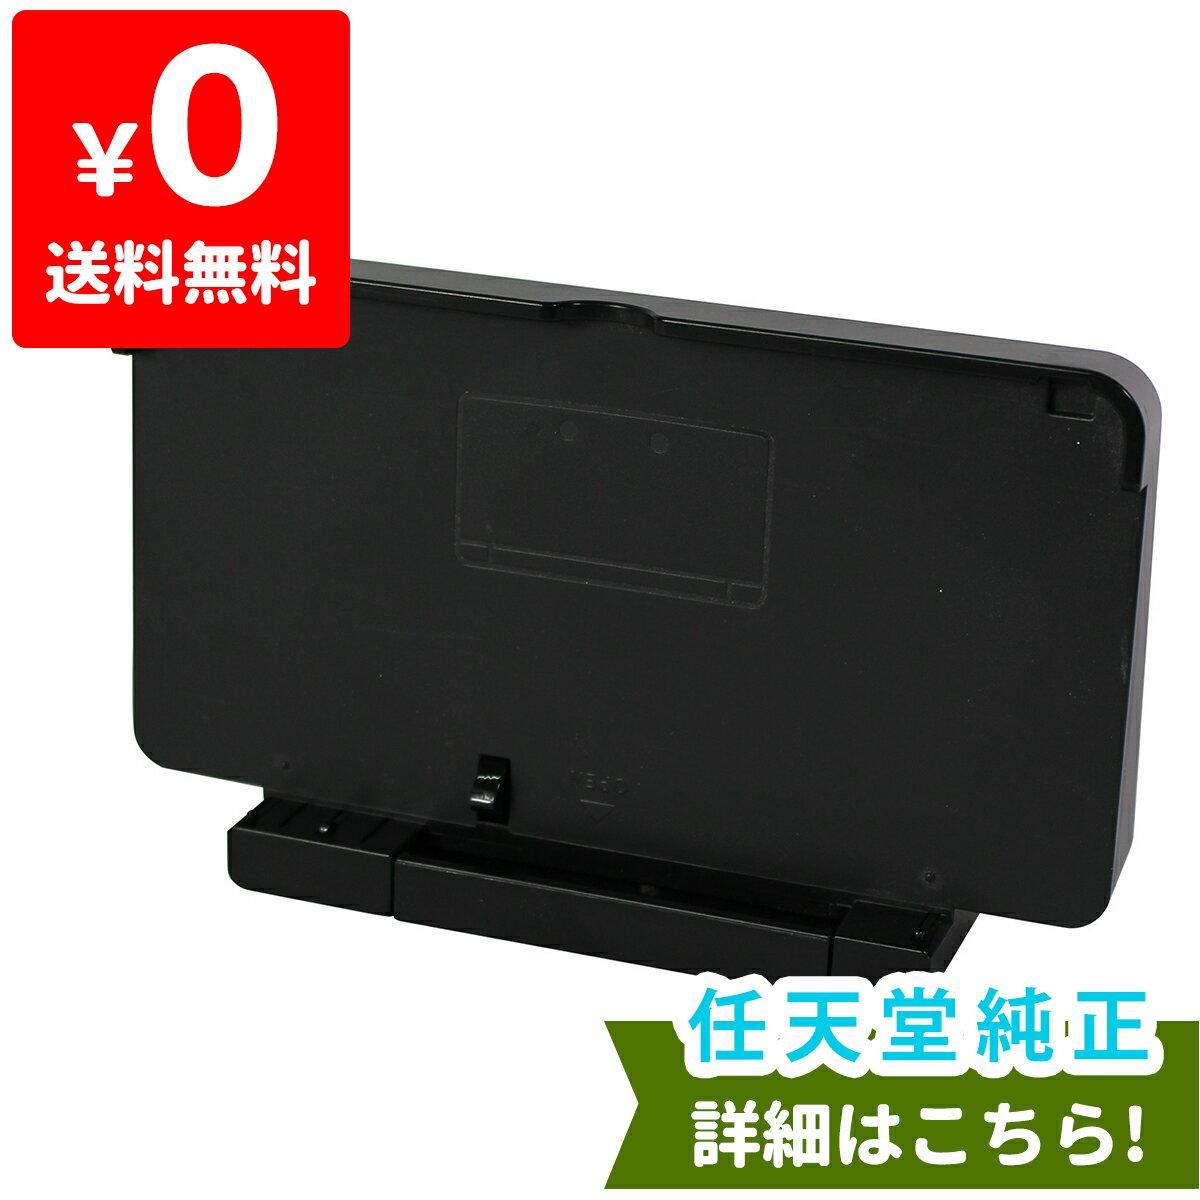 3DS専用 充電台 純正 ニンテンドー 任天堂 Nintendo 【中古】 4902370518801 送料無料